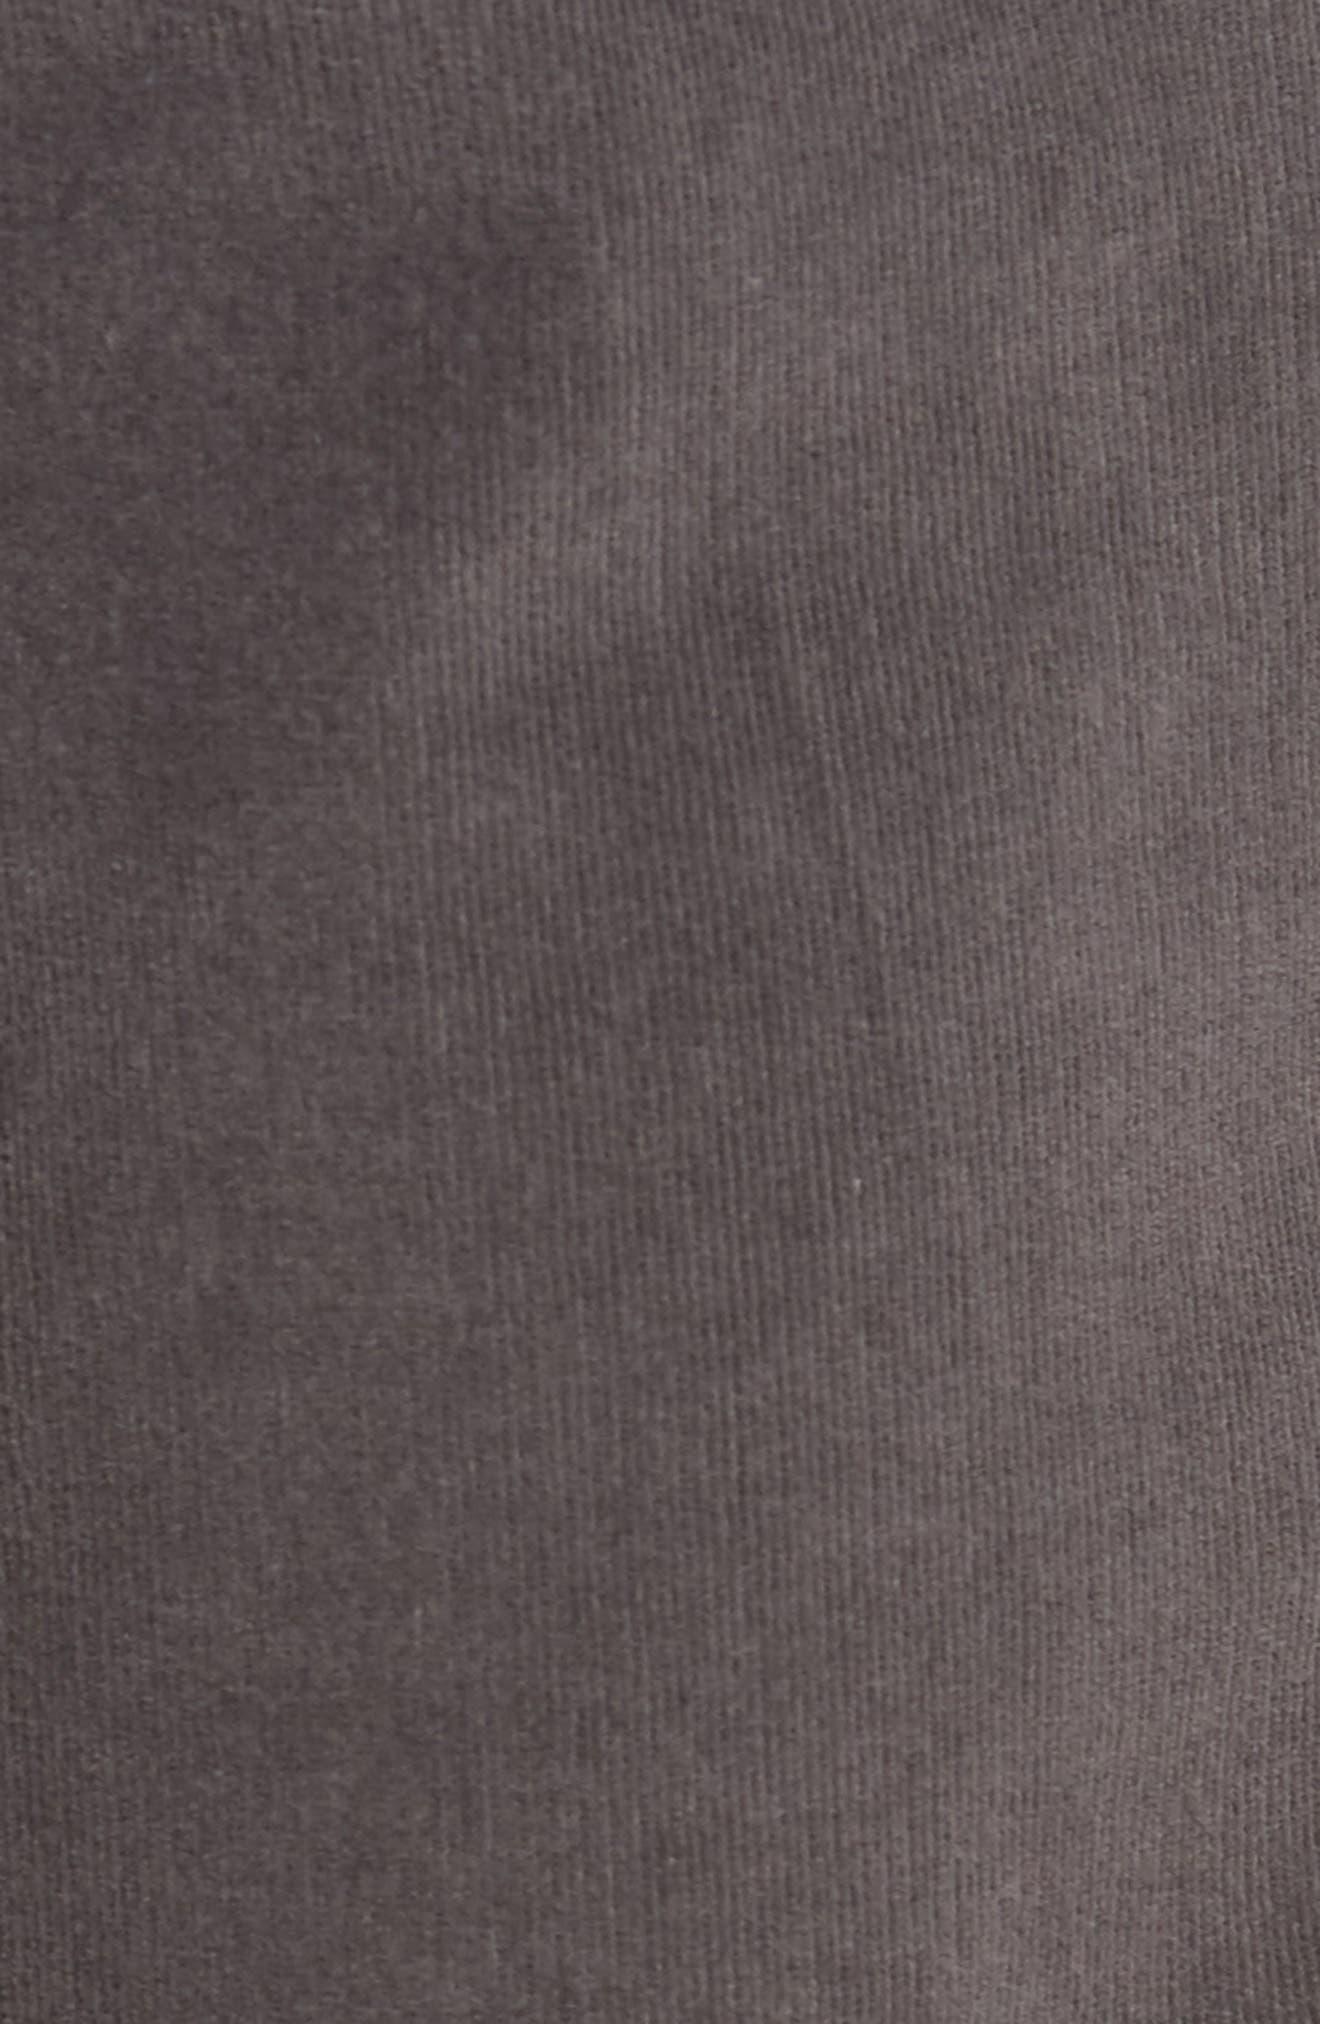 VINTAGE 1946,                             Modern Fit Stretch Corduroy Pants,                             Alternate thumbnail 5, color,                             CHARCOAL